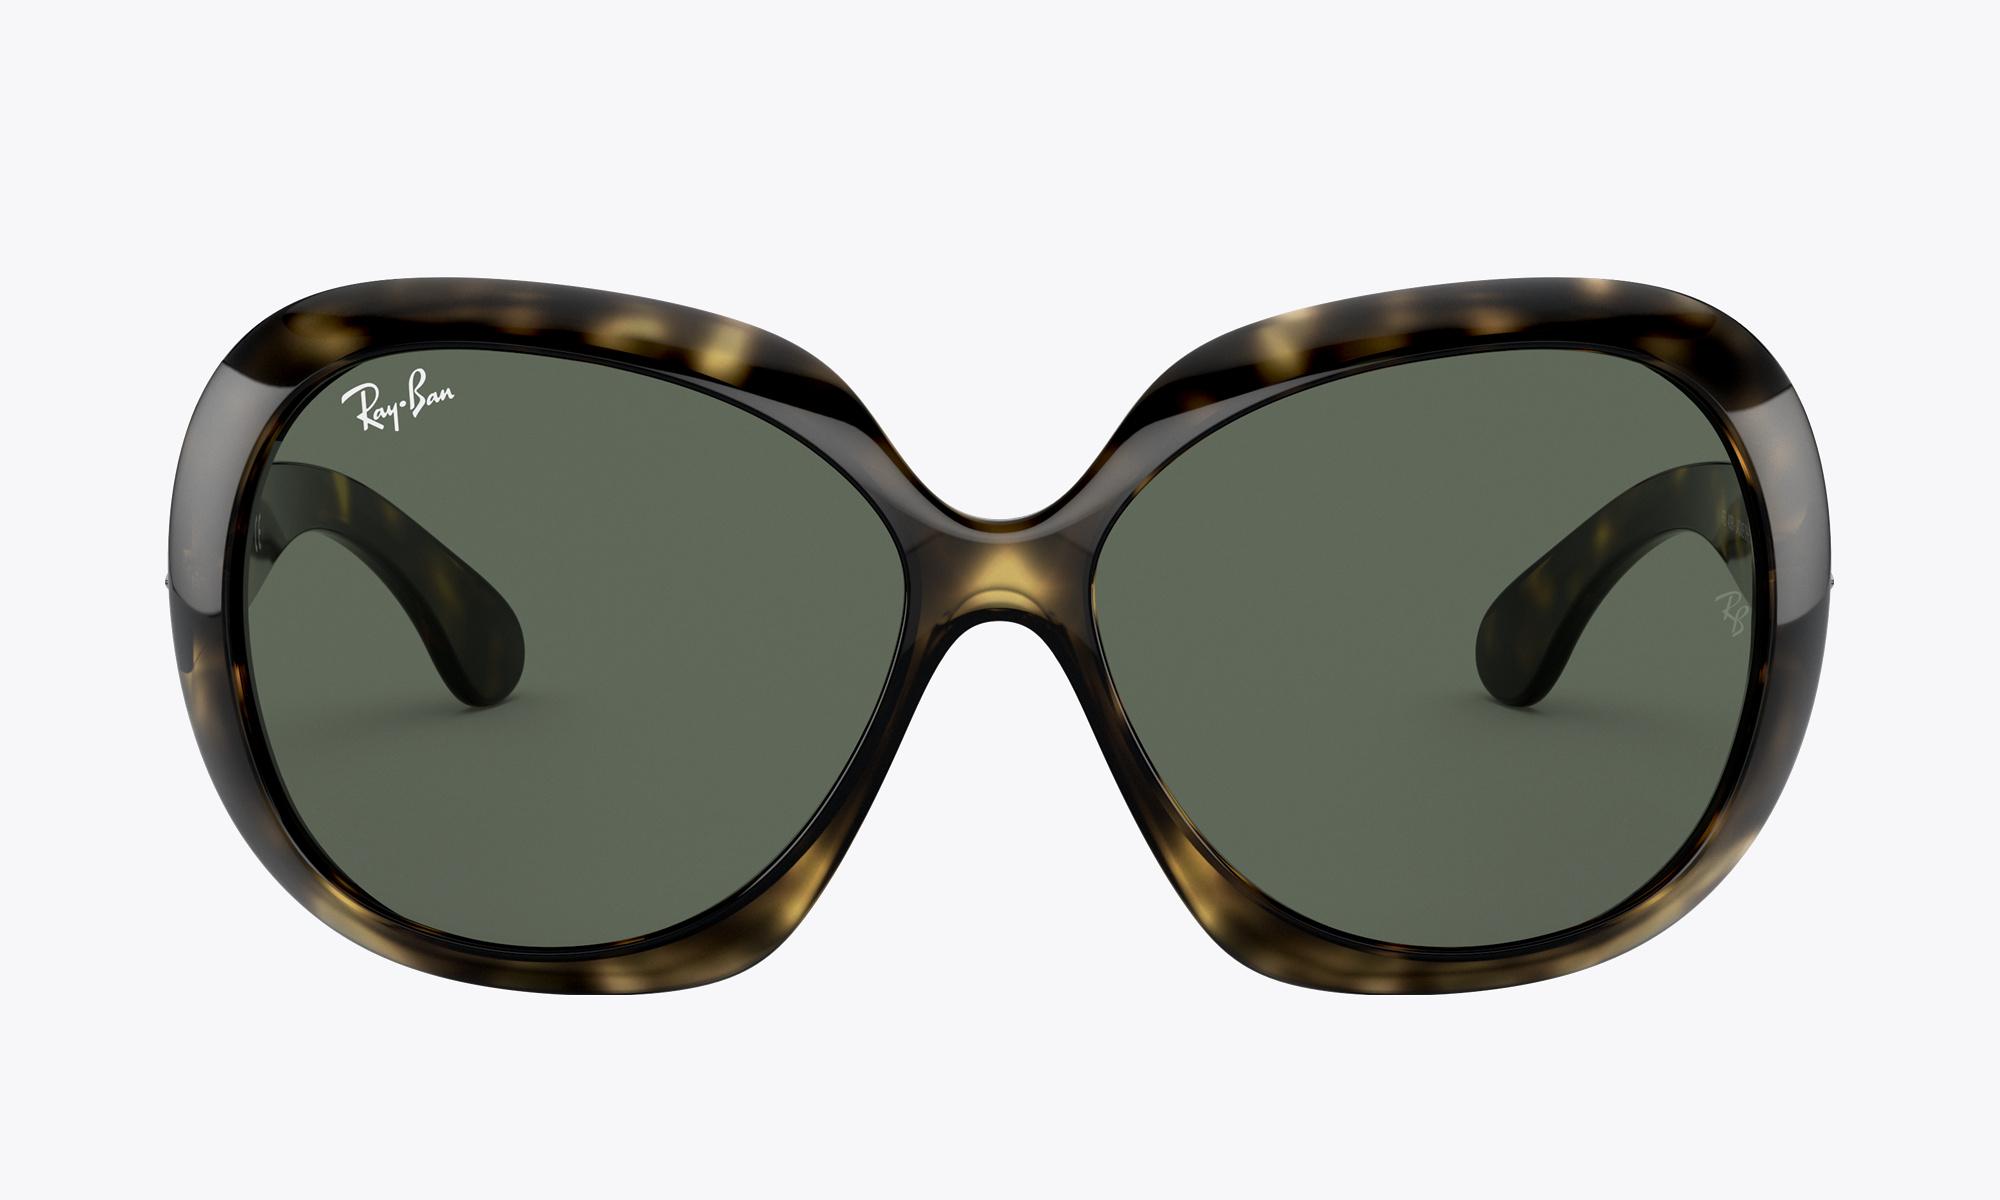 Image of Ray-Ban JACKIE OHH II color Tortoise